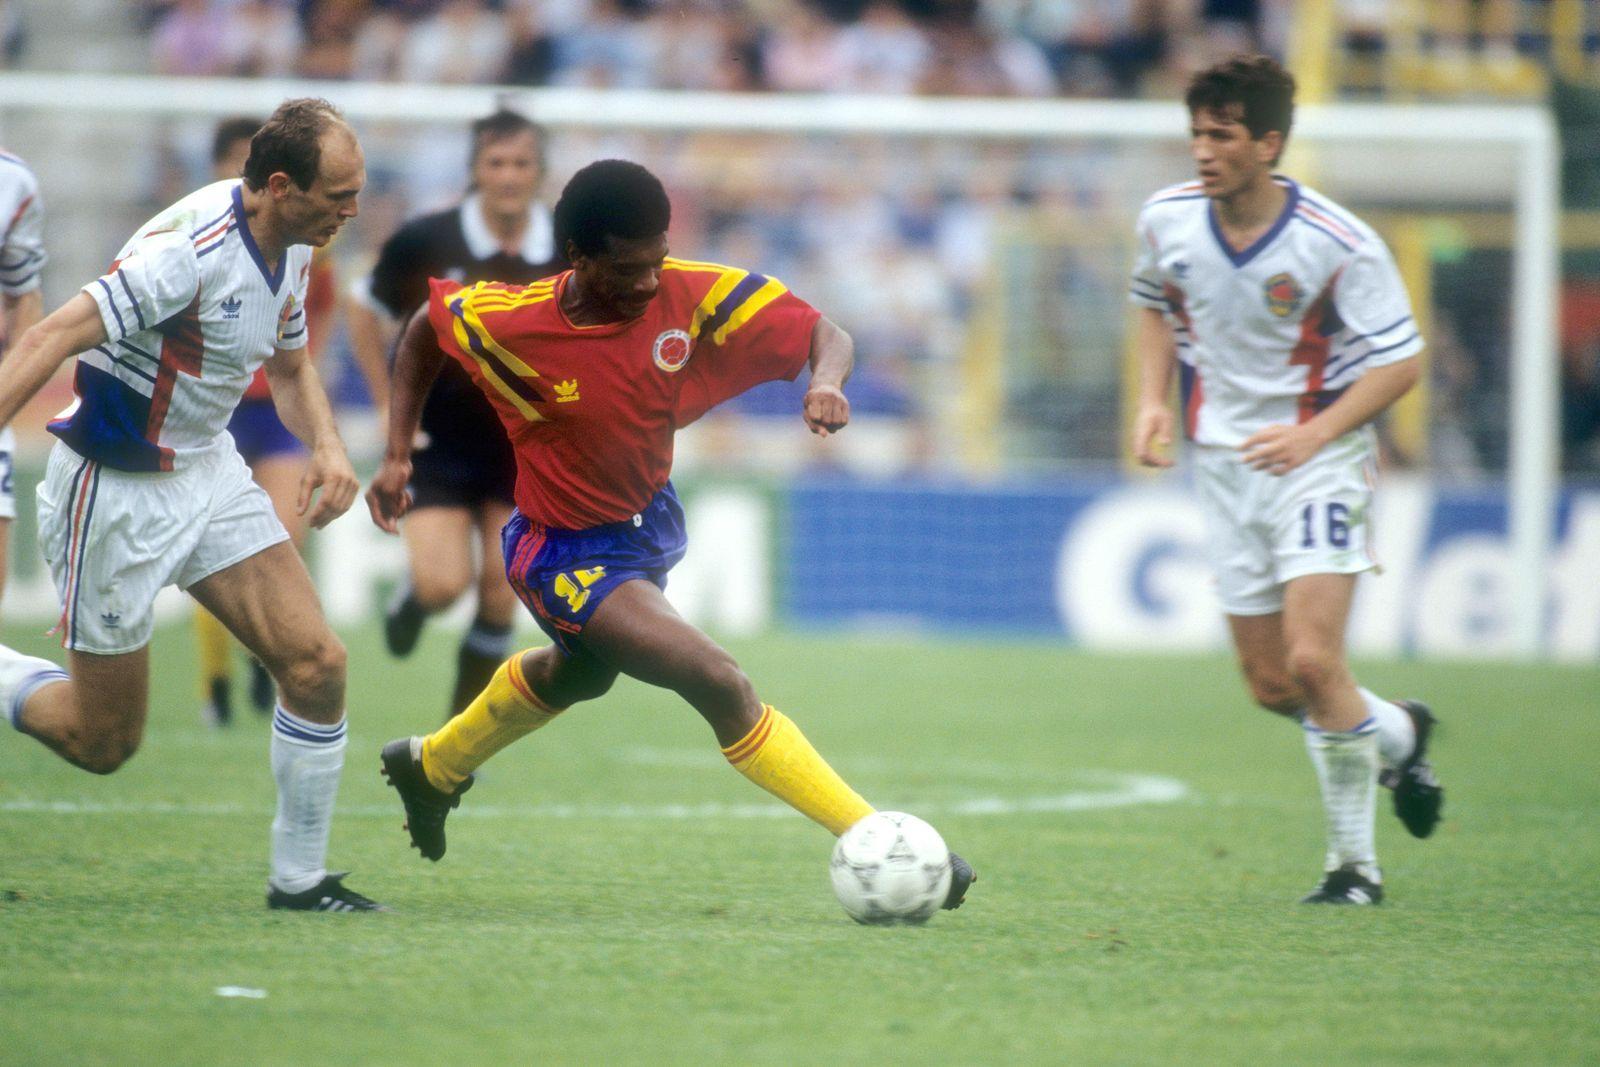 EINMALIGE VERWENDUNG Arnoldo Iguarán/ Arnoldo Iguaran/ Kolumbien/ 1990